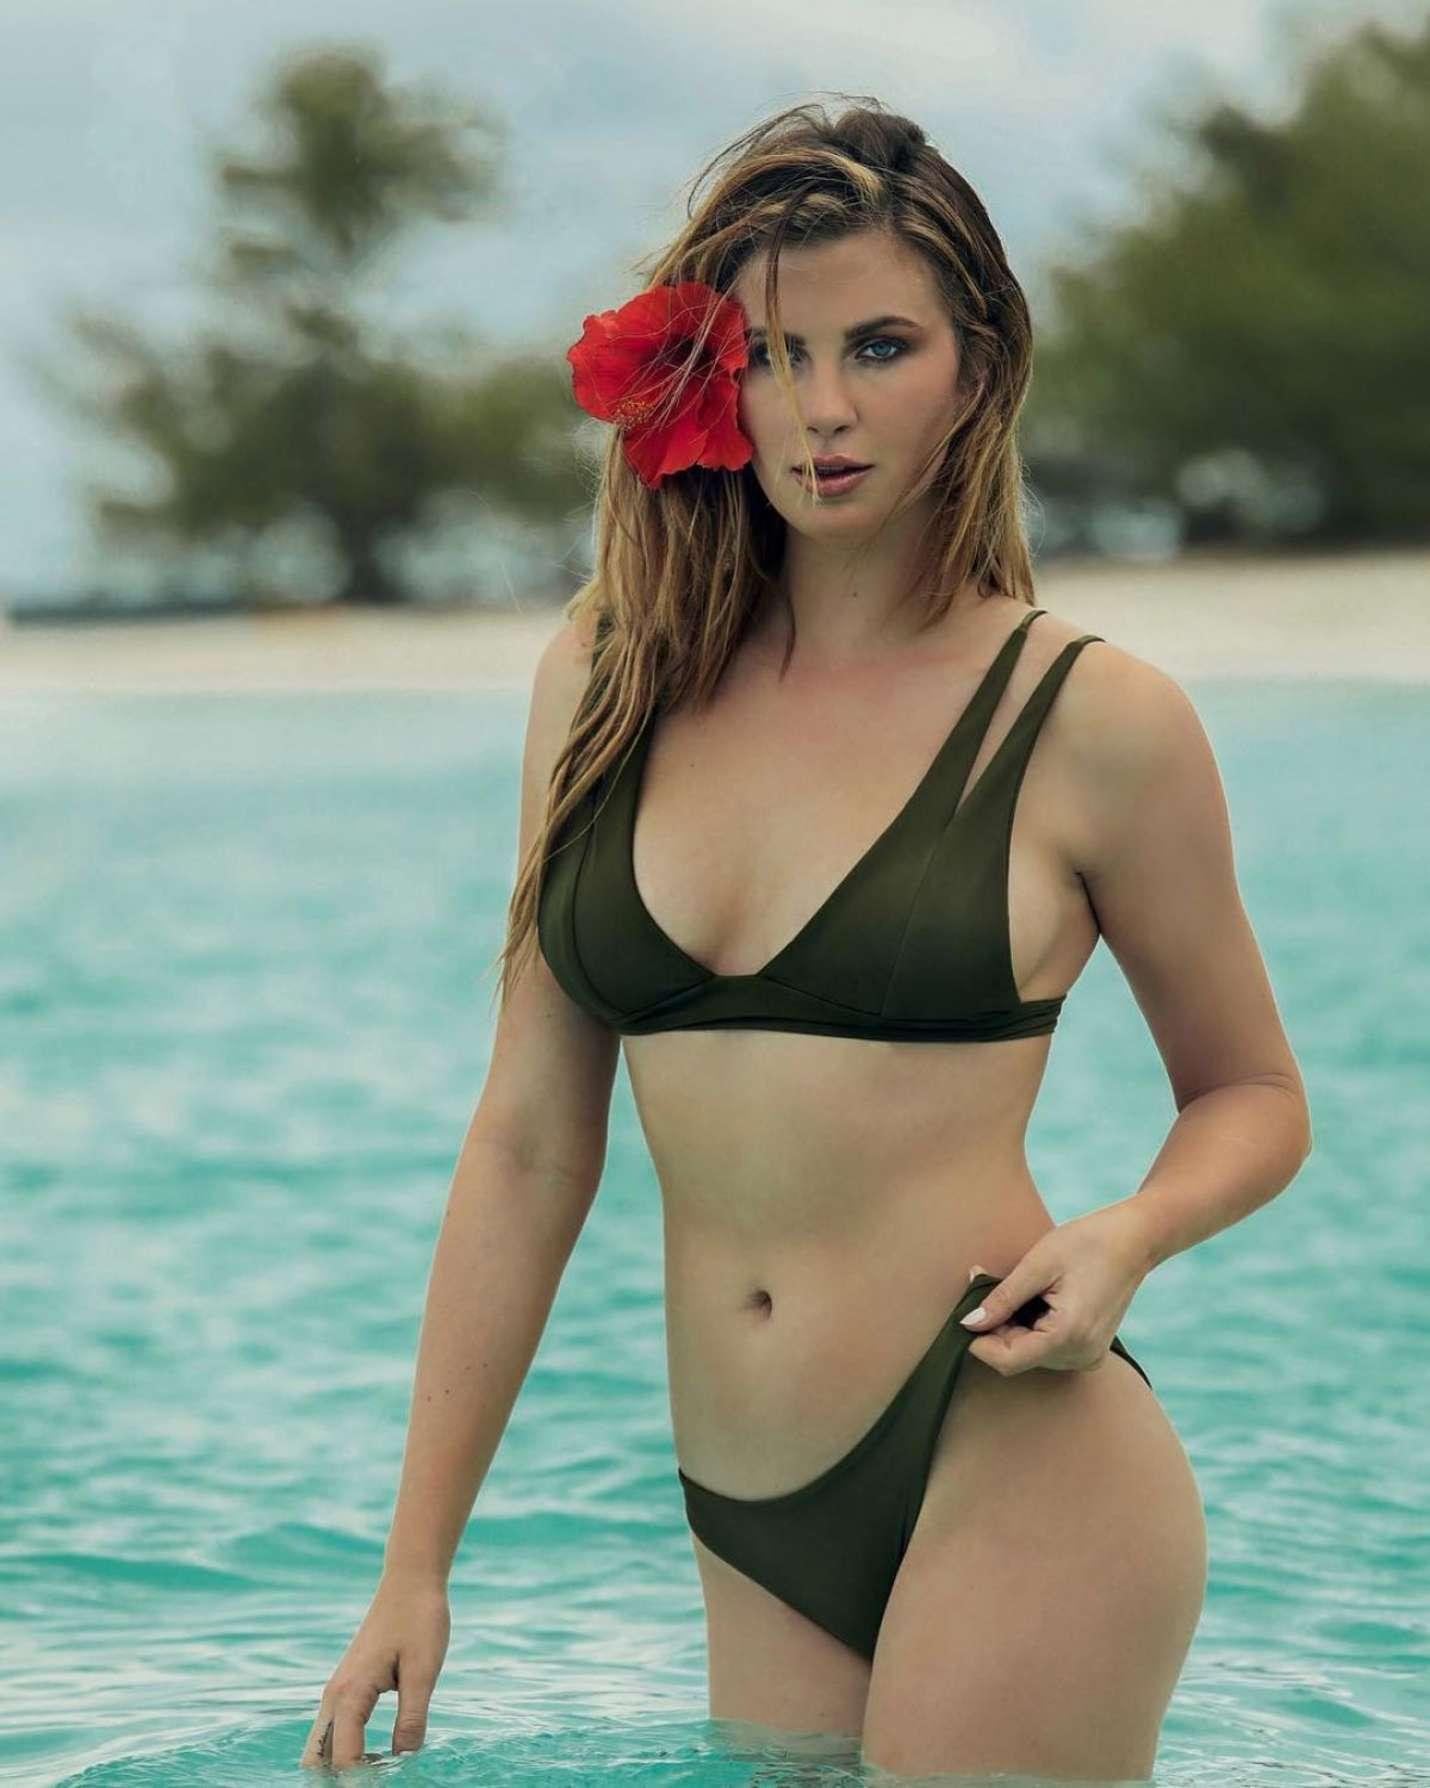 Ireland Baldwin Topless   Hot Celebs Home